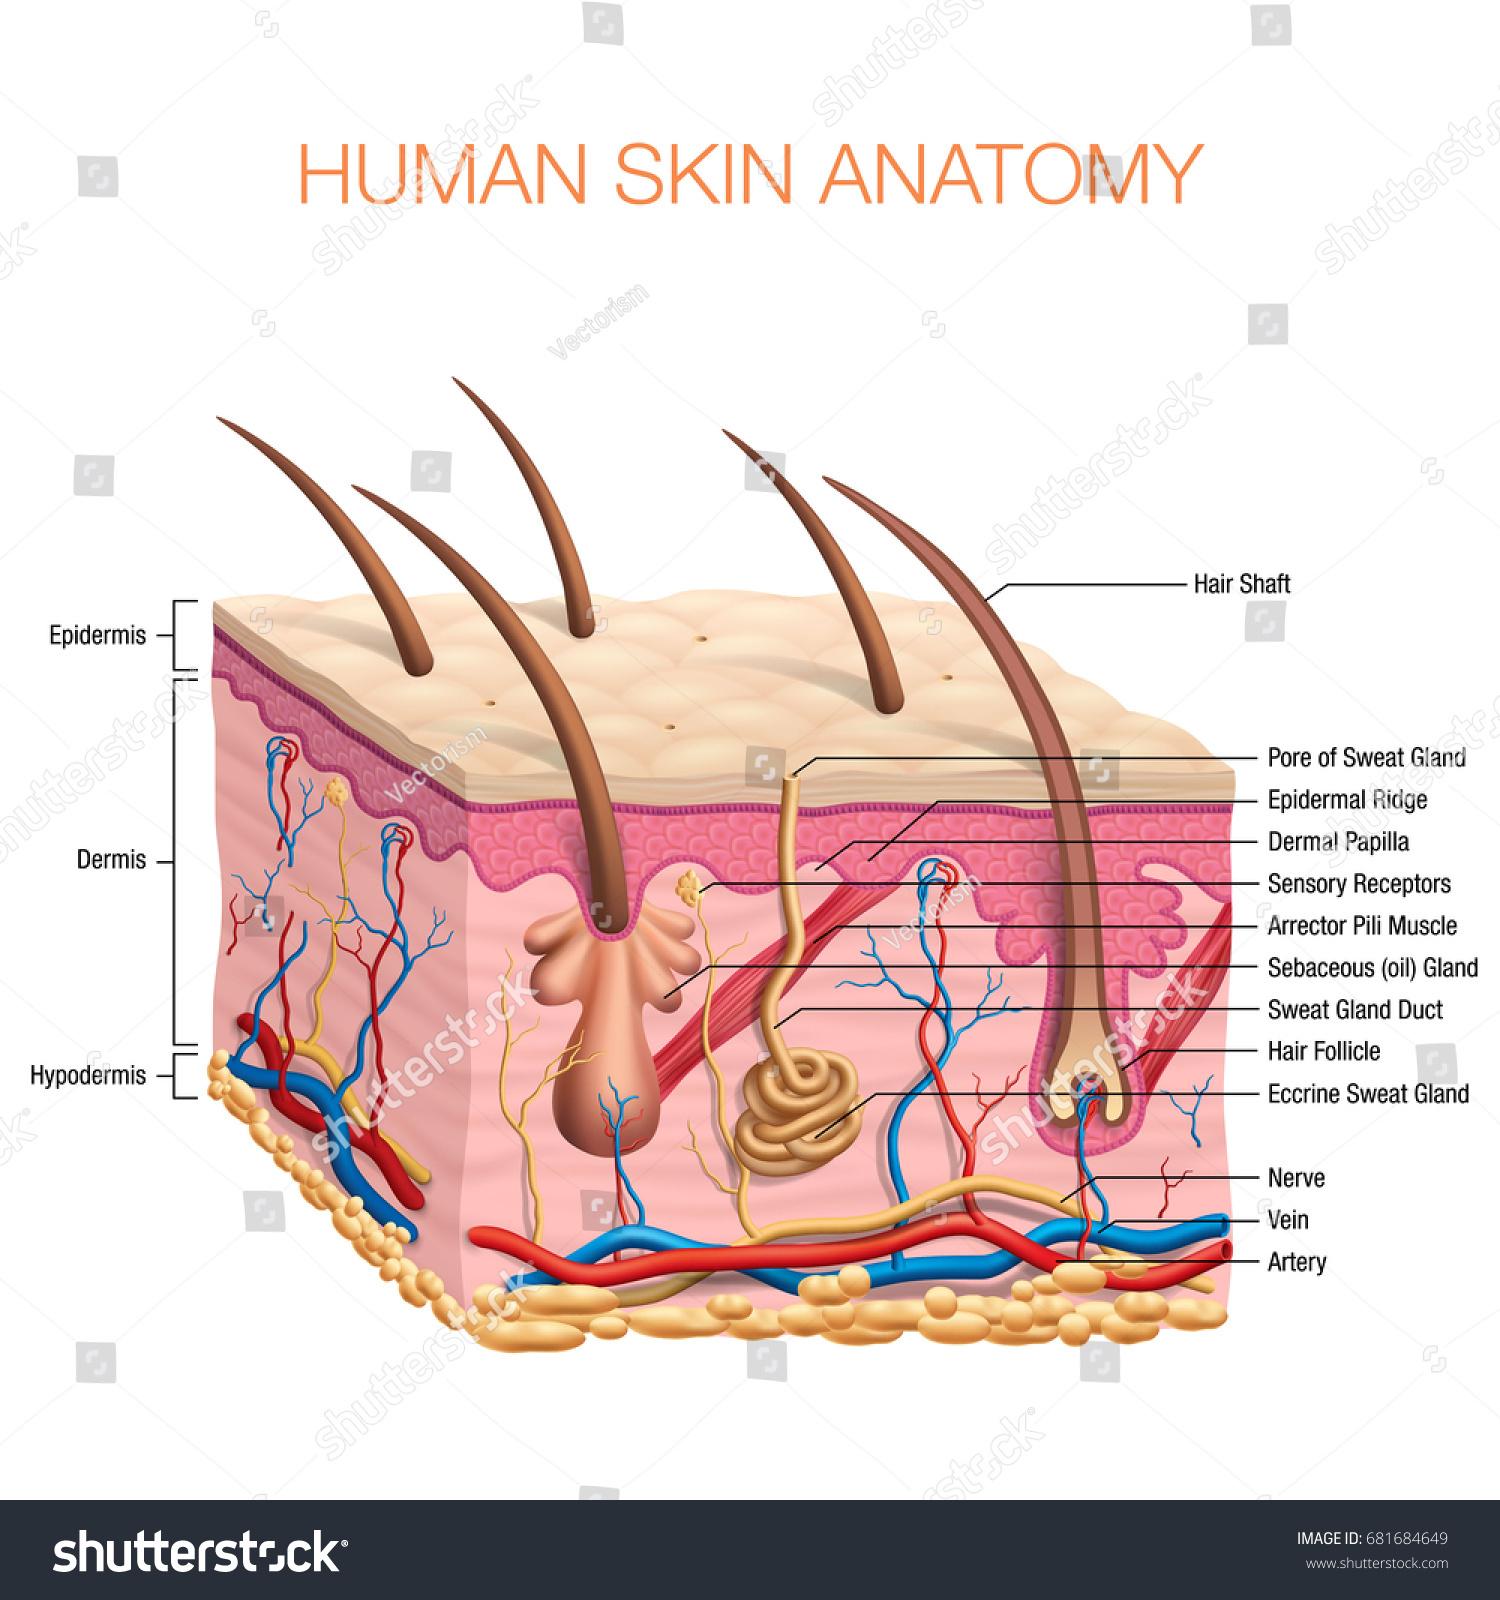 Human Skin Anatomy Vector Illustration Isolated Stock Vector